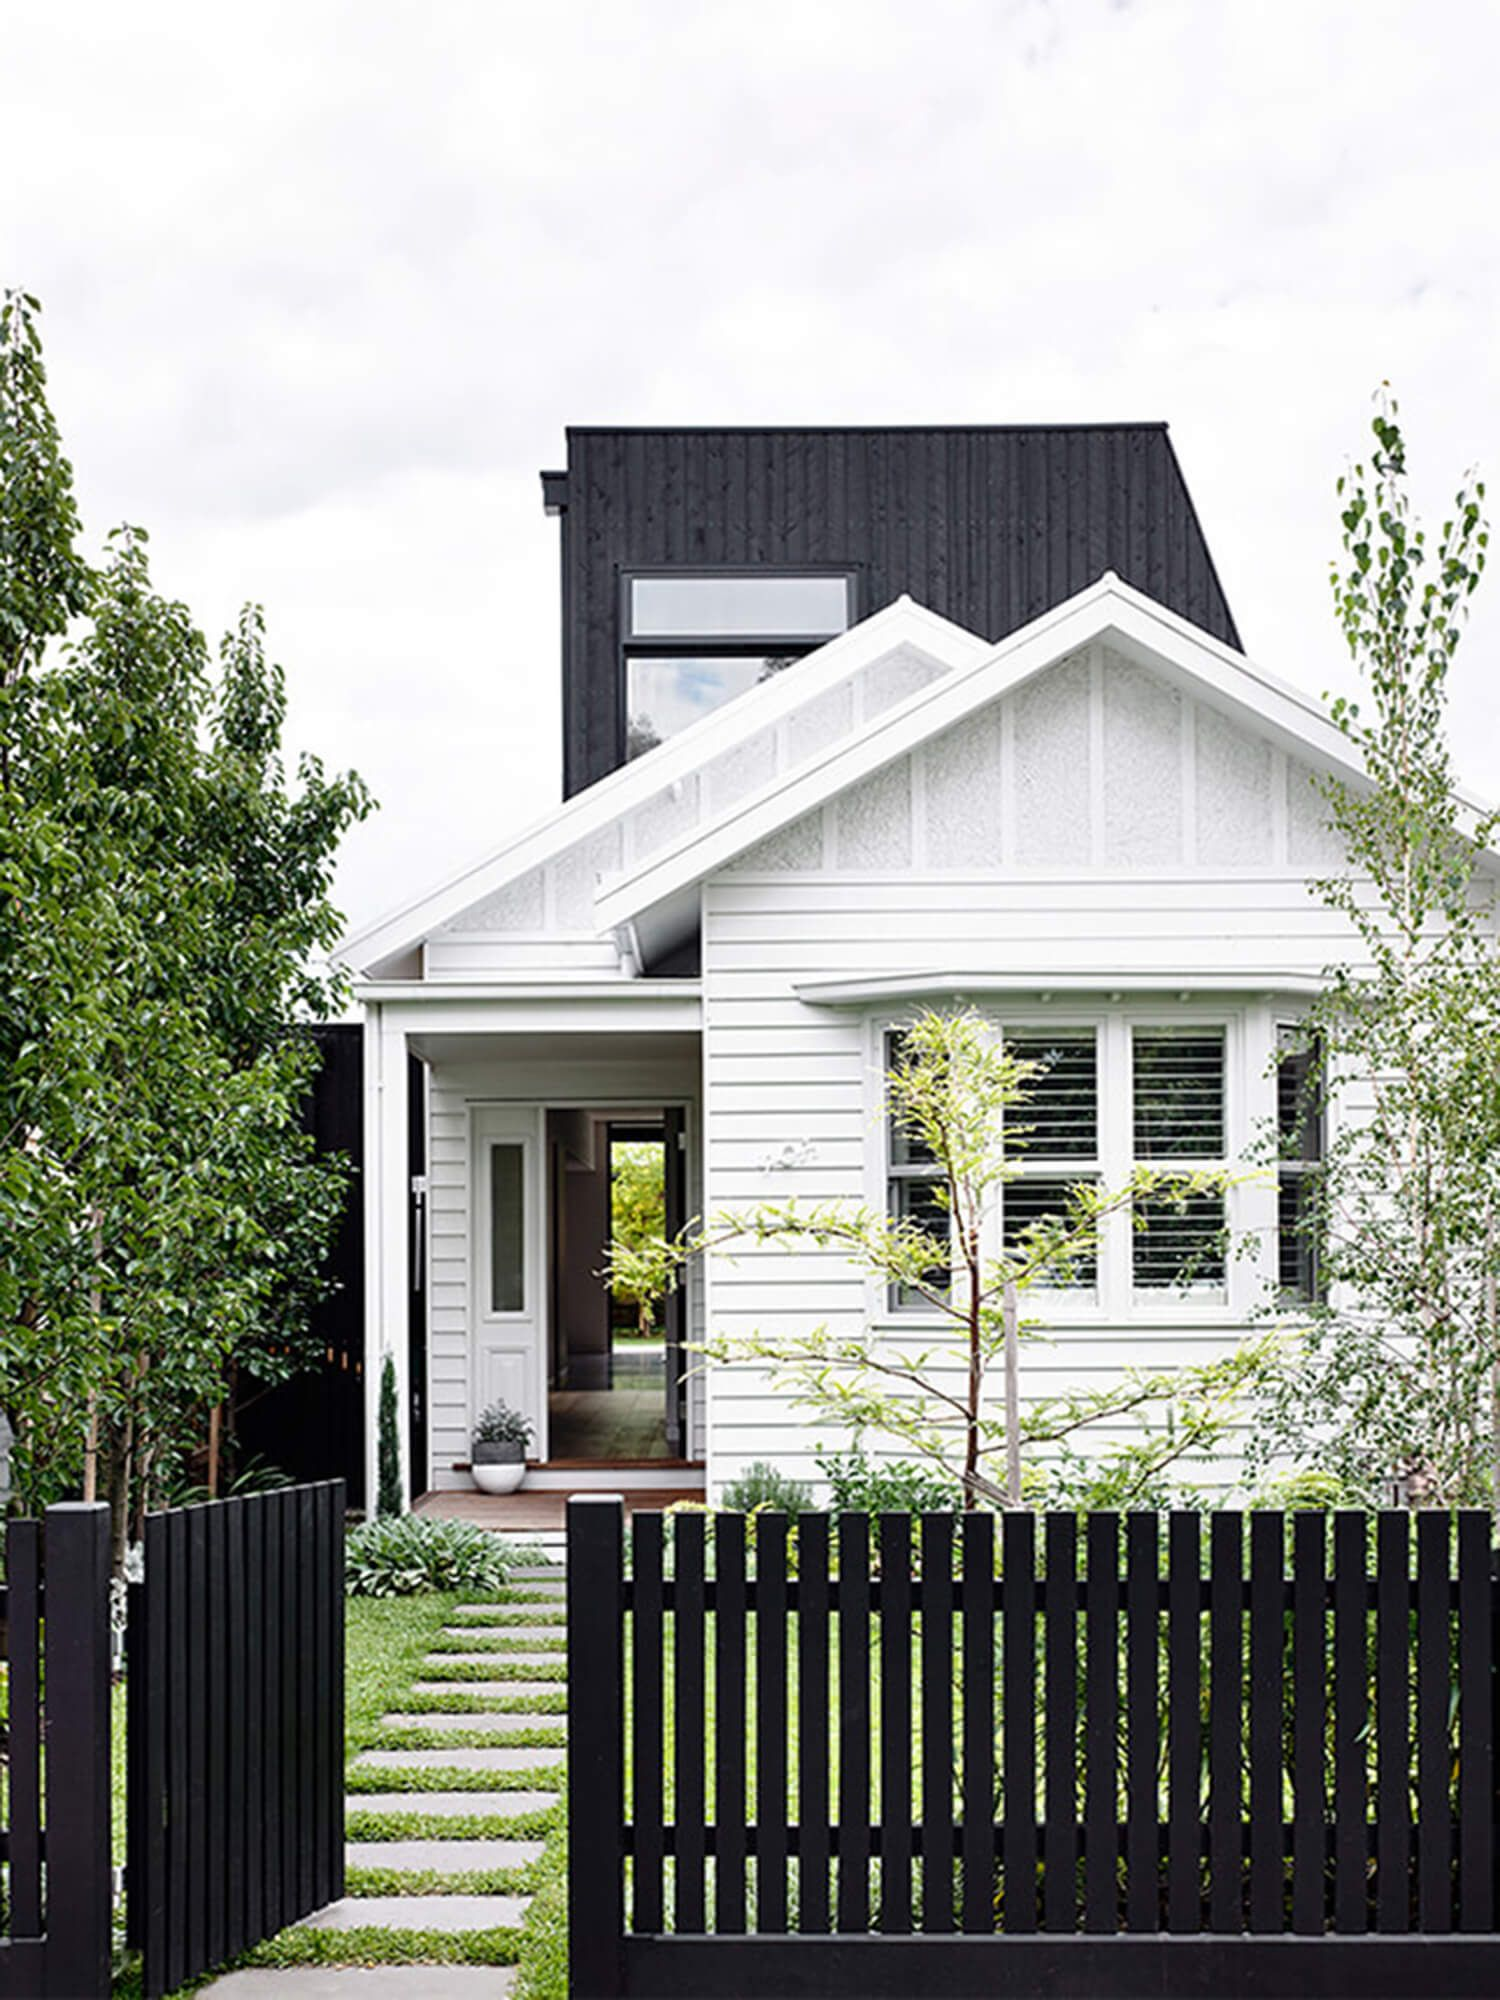 Exterior | Northcote House by Heartly Design | est living ...